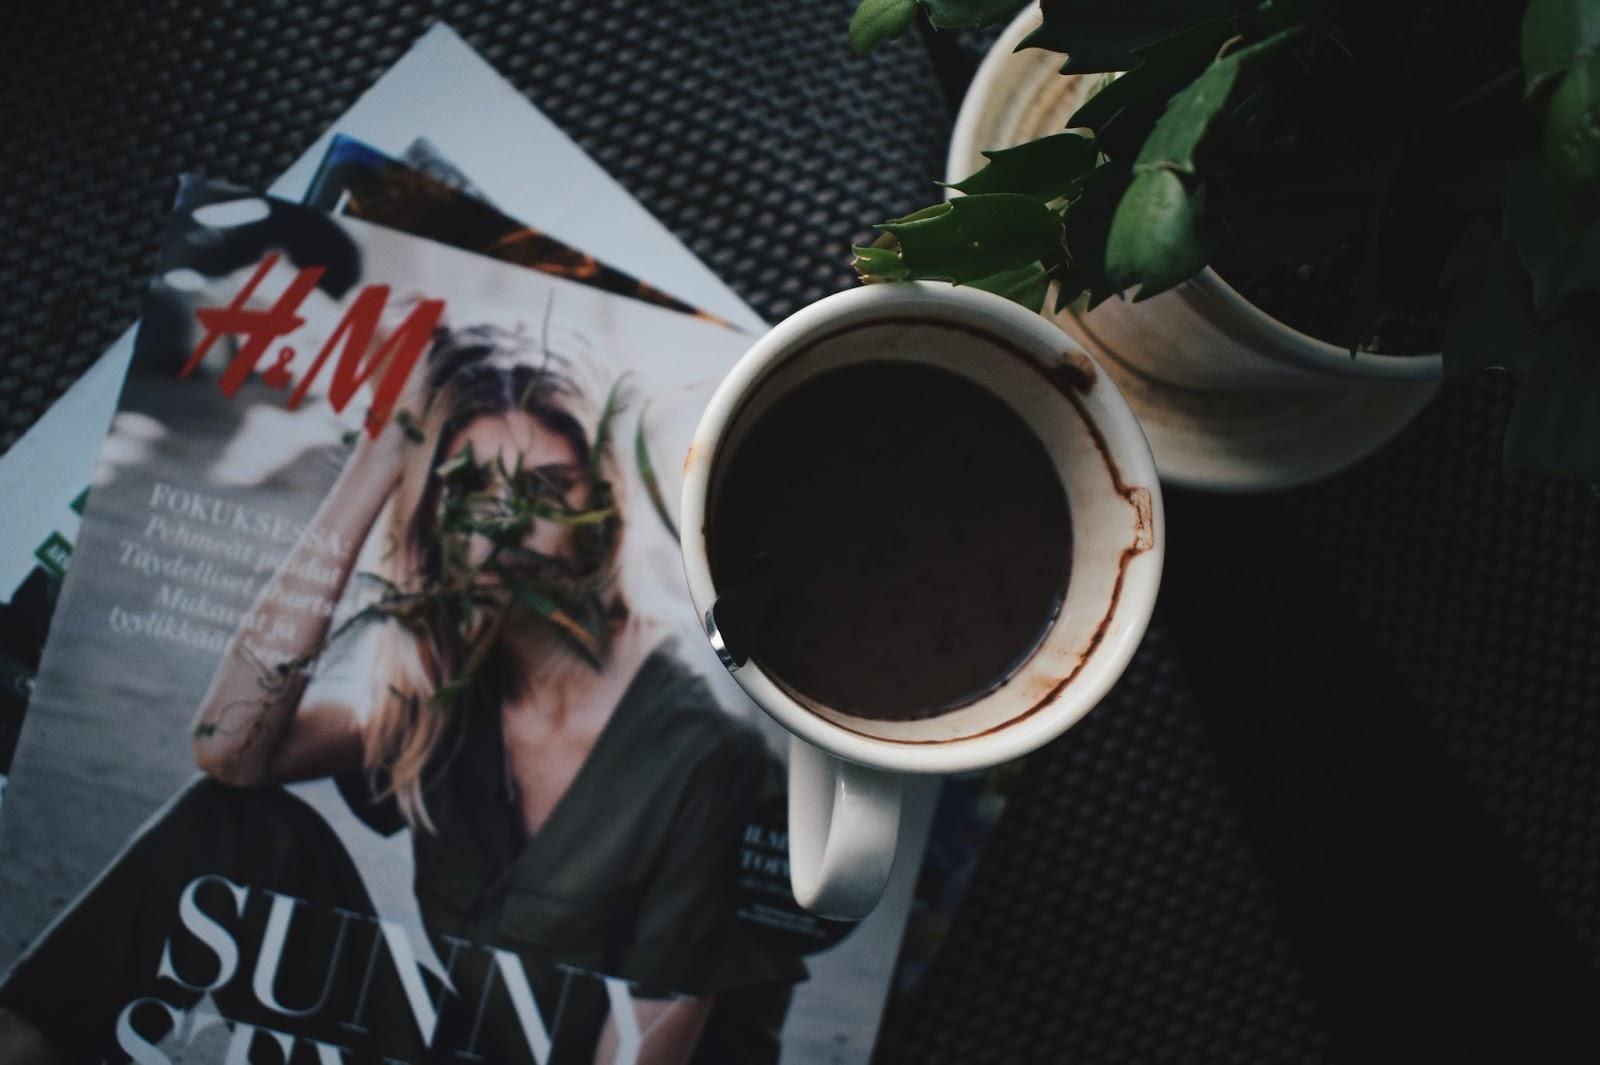 kahvi aamukahvi kahvikuppi kevätmasennus masennus mielenterveys mielenterveysongelmat h&m kuvasto vaatekuvasto sotku